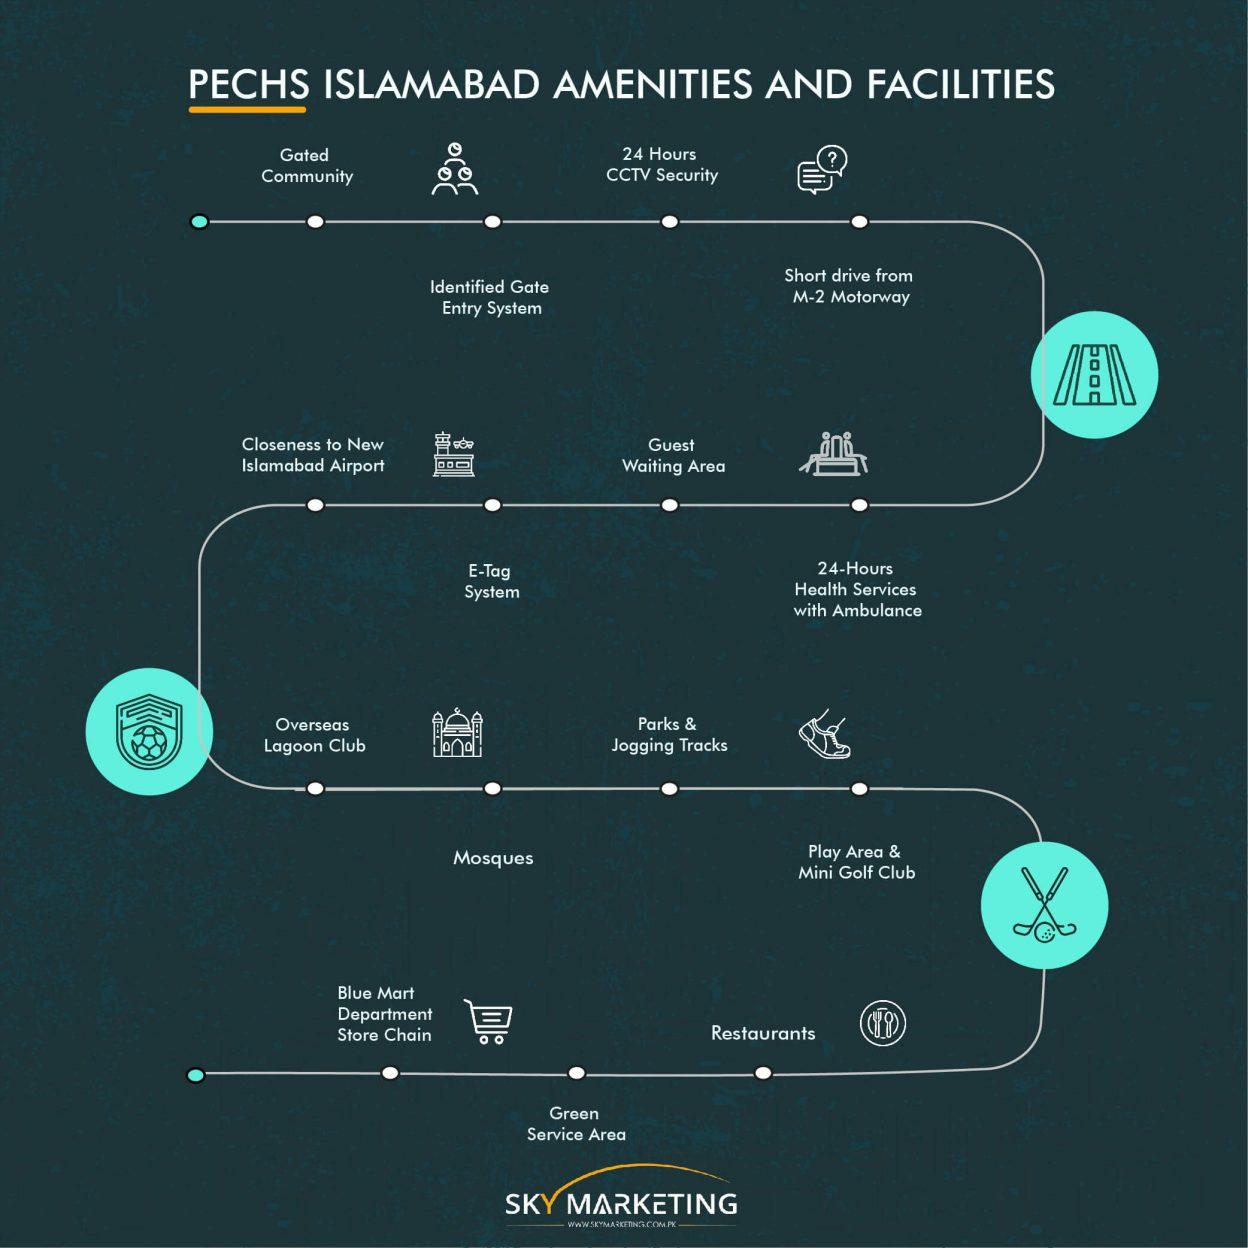 Pechs Islamabad Amenities and facilities